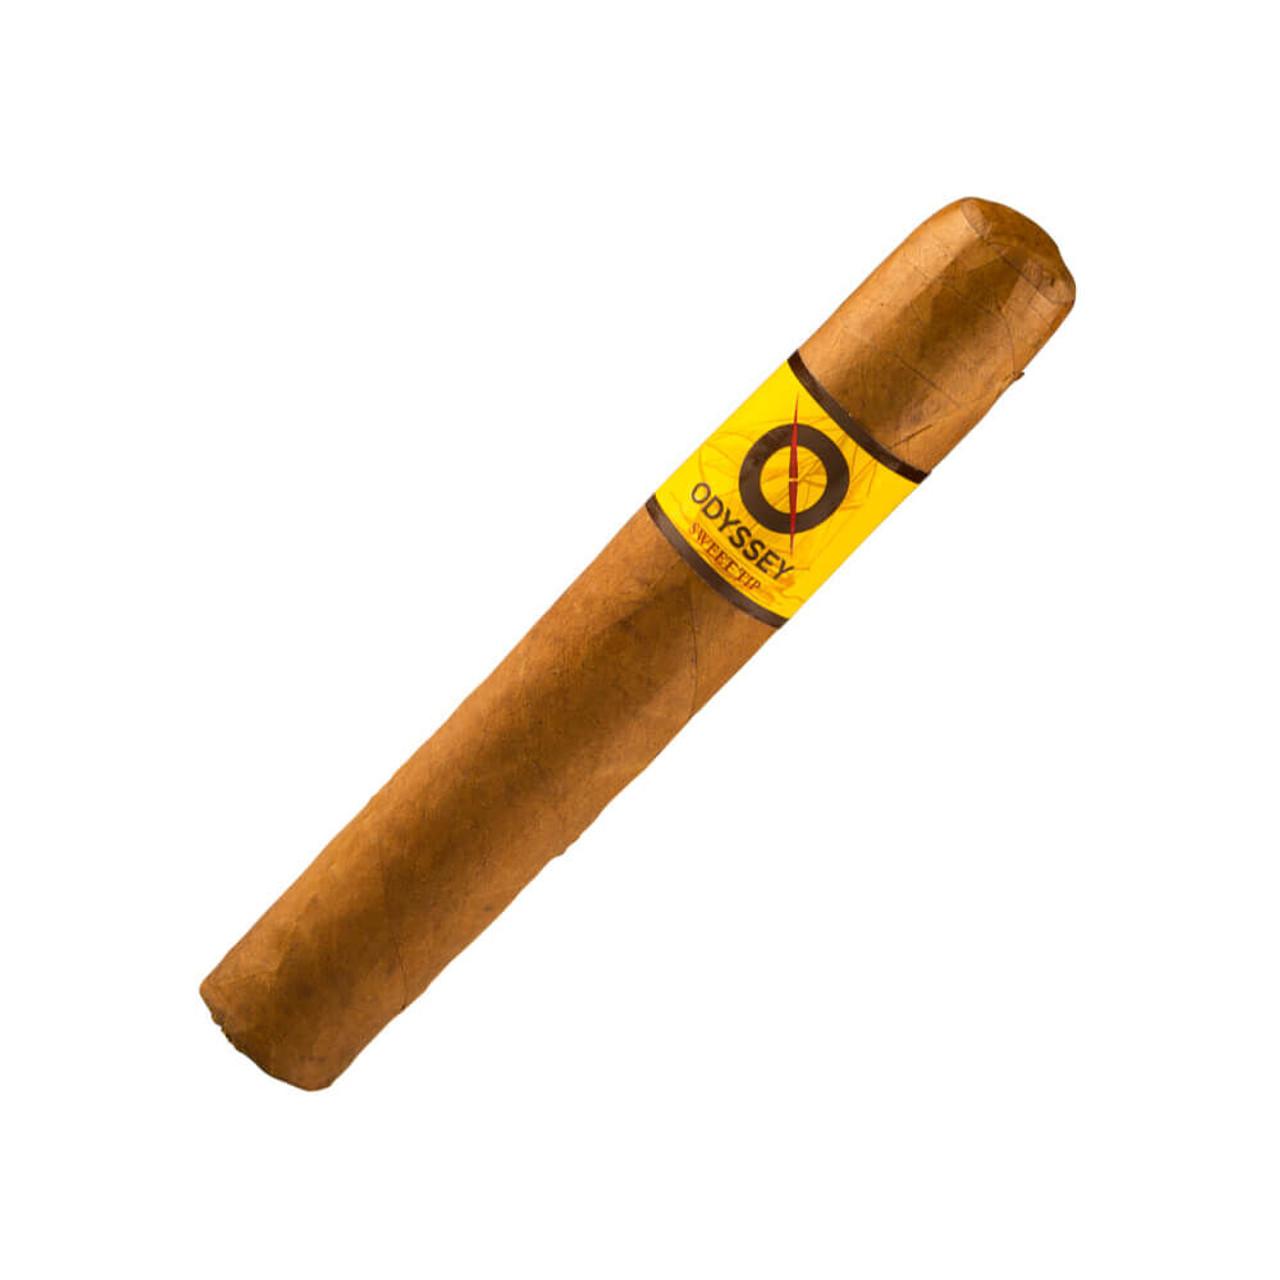 Odyssey Sweet Tip Gigante Cigars - 6 x 60 (Bundle of 10)